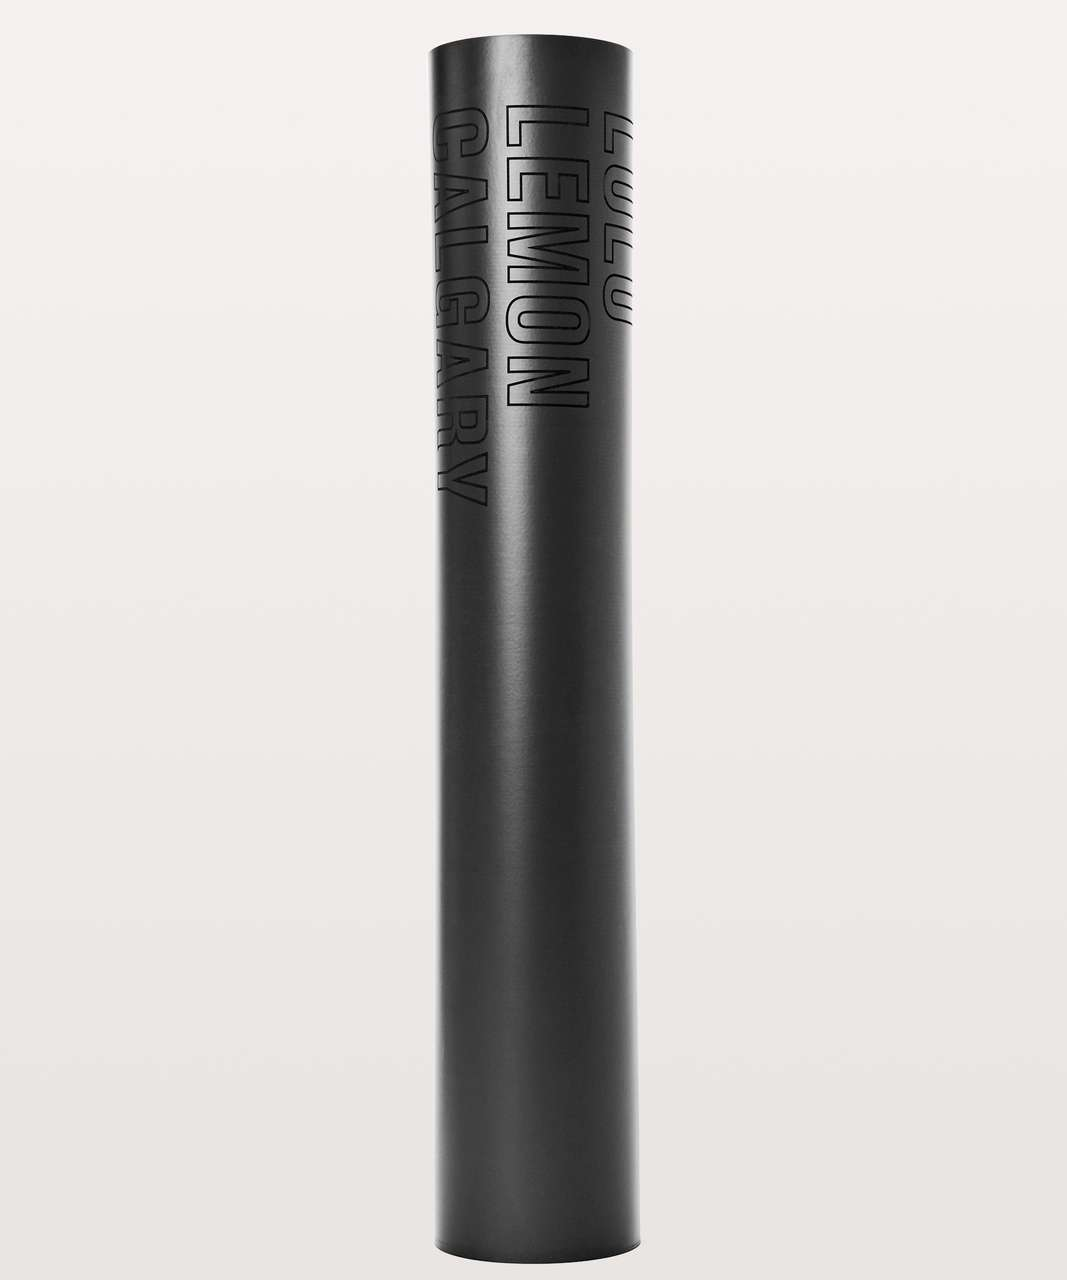 Lululemon The Reversible Mat 5mm Calgary - My City Mat Calgary